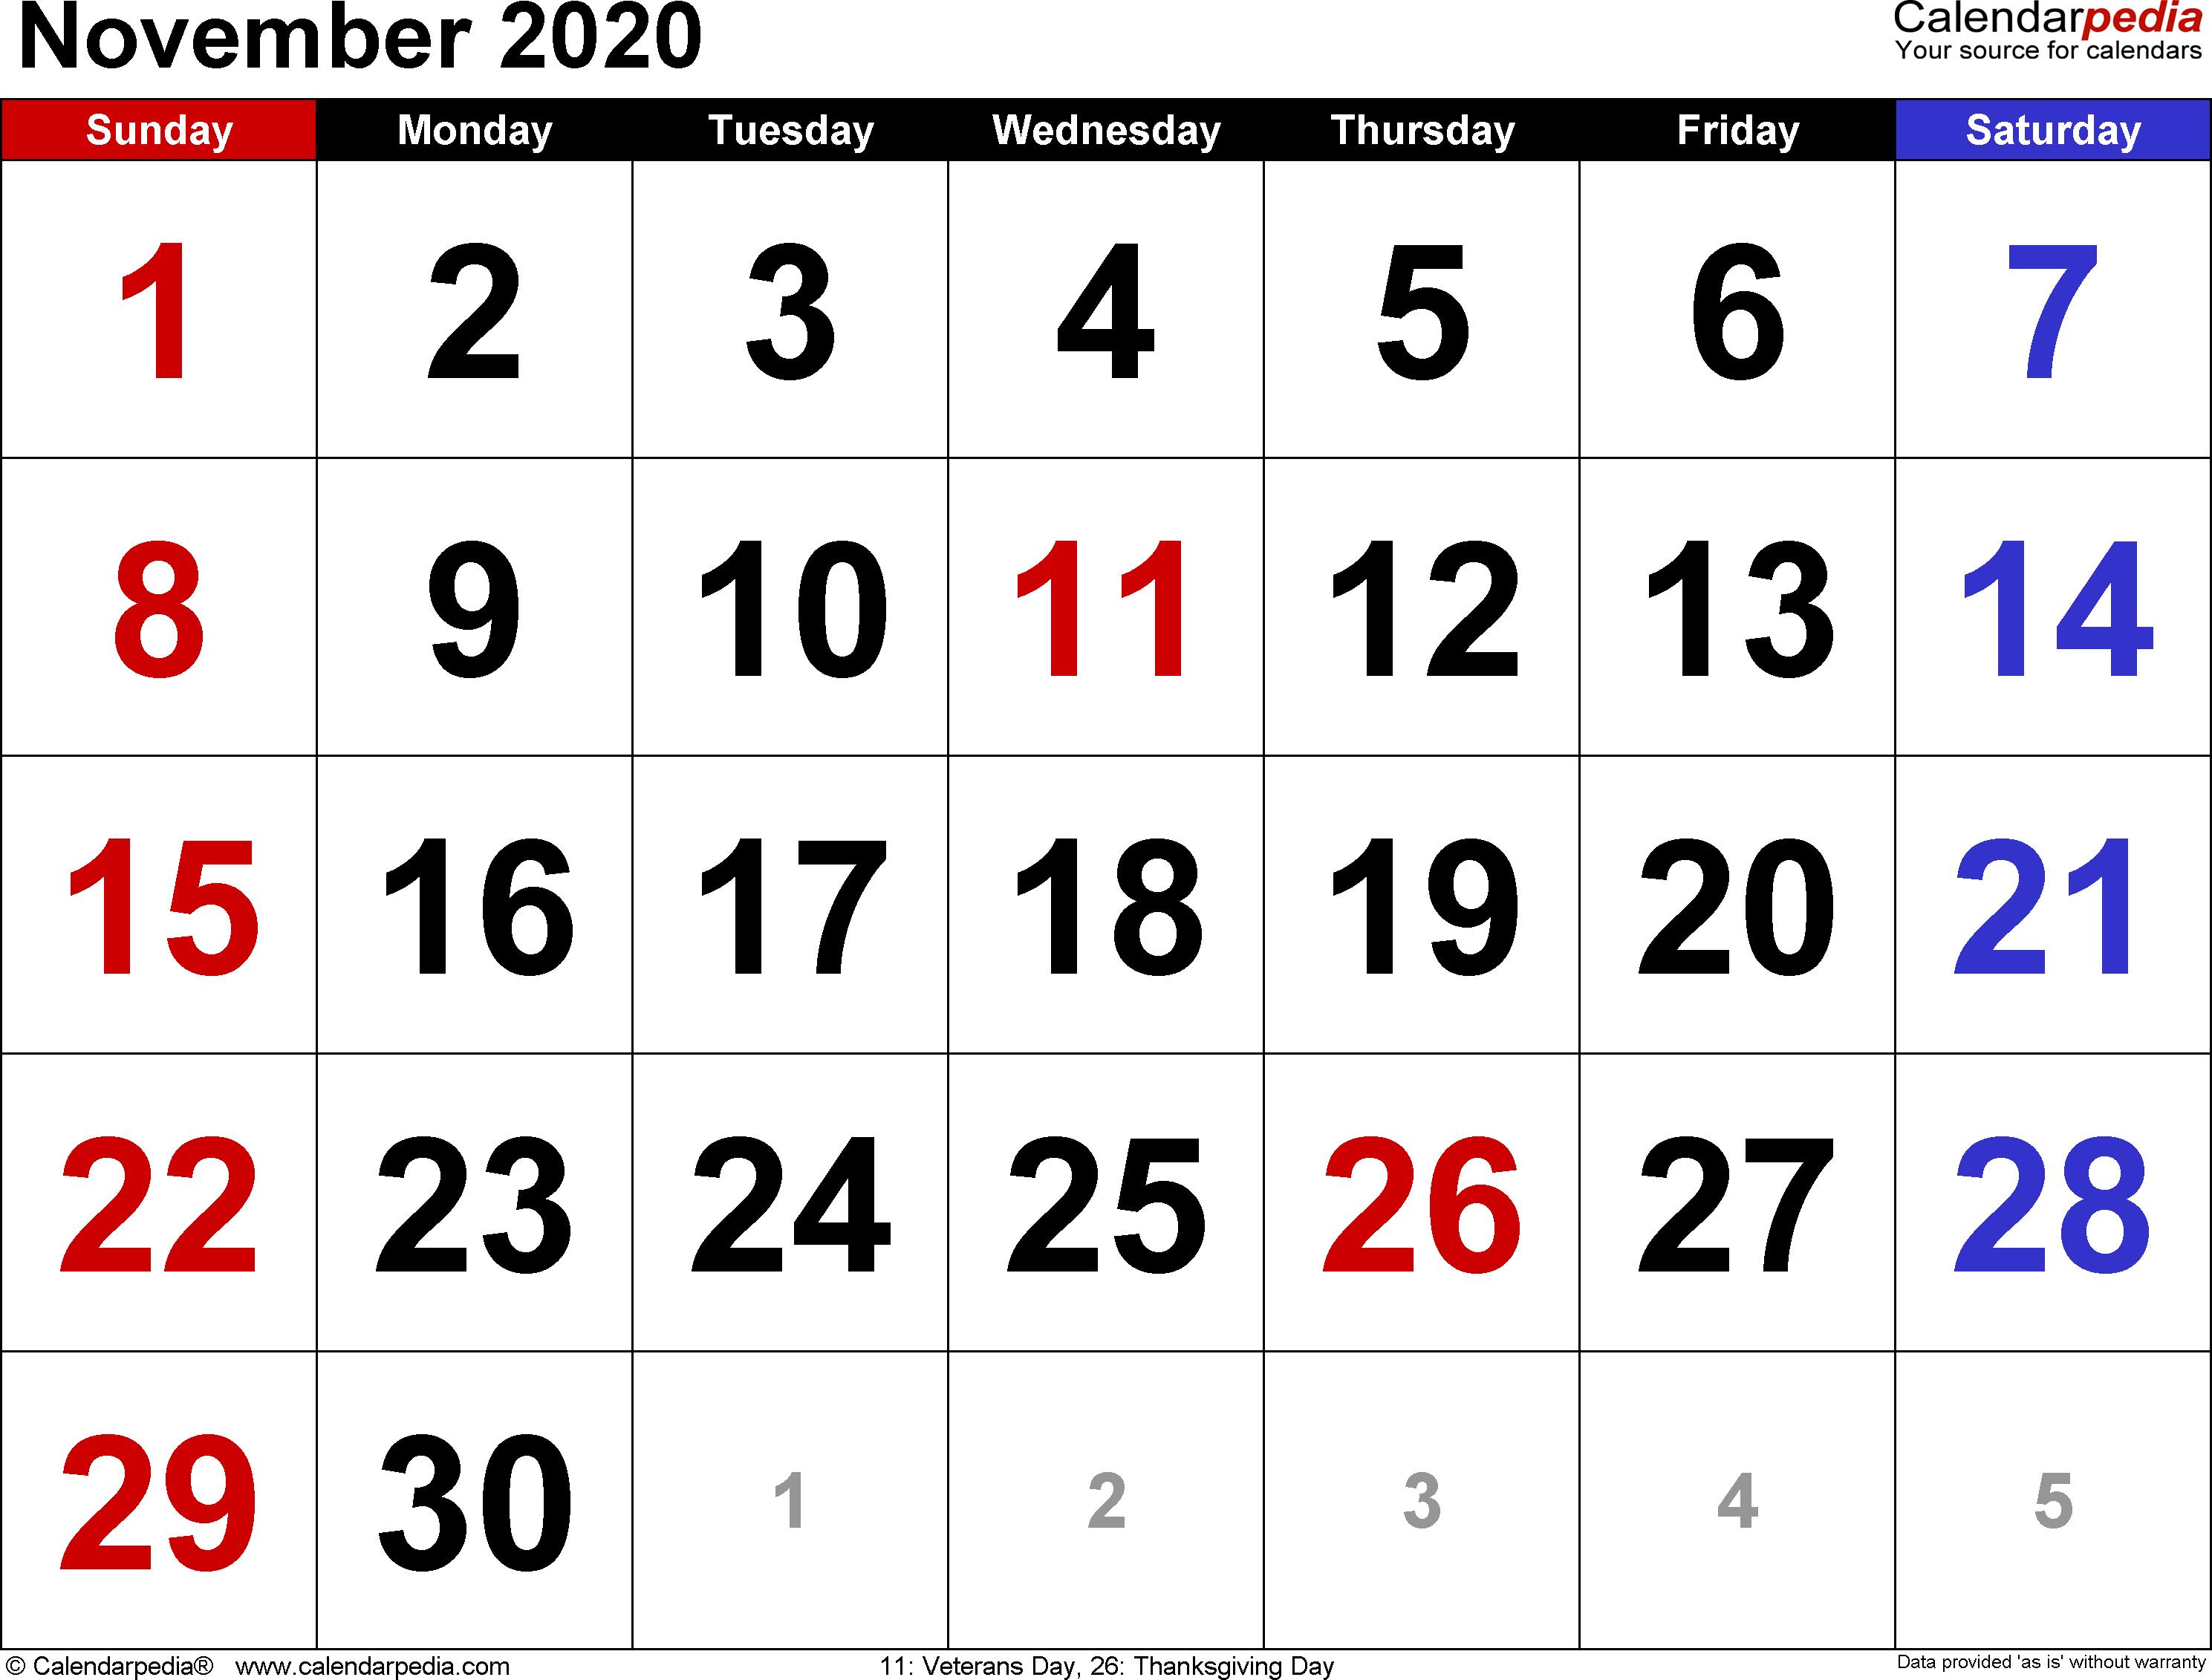 November 2020 Calendar Pdf November 2020 Calendars for Word, Excel & PDF